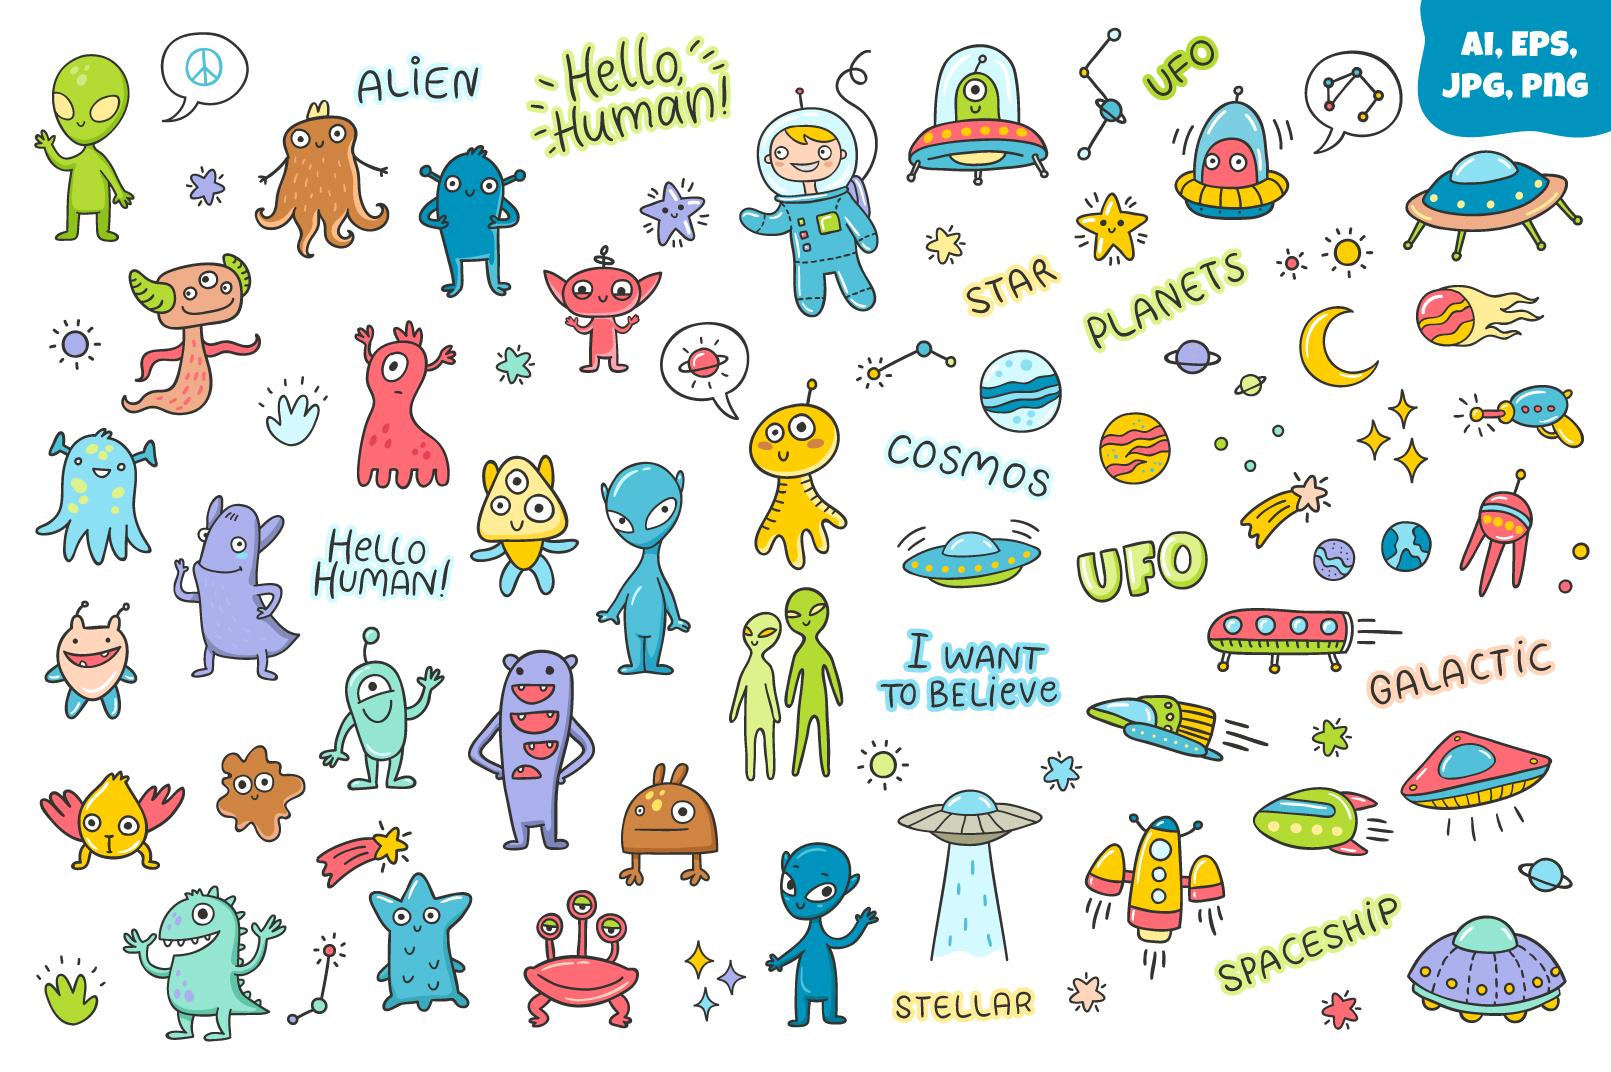 Aliens & UFOs example image 2